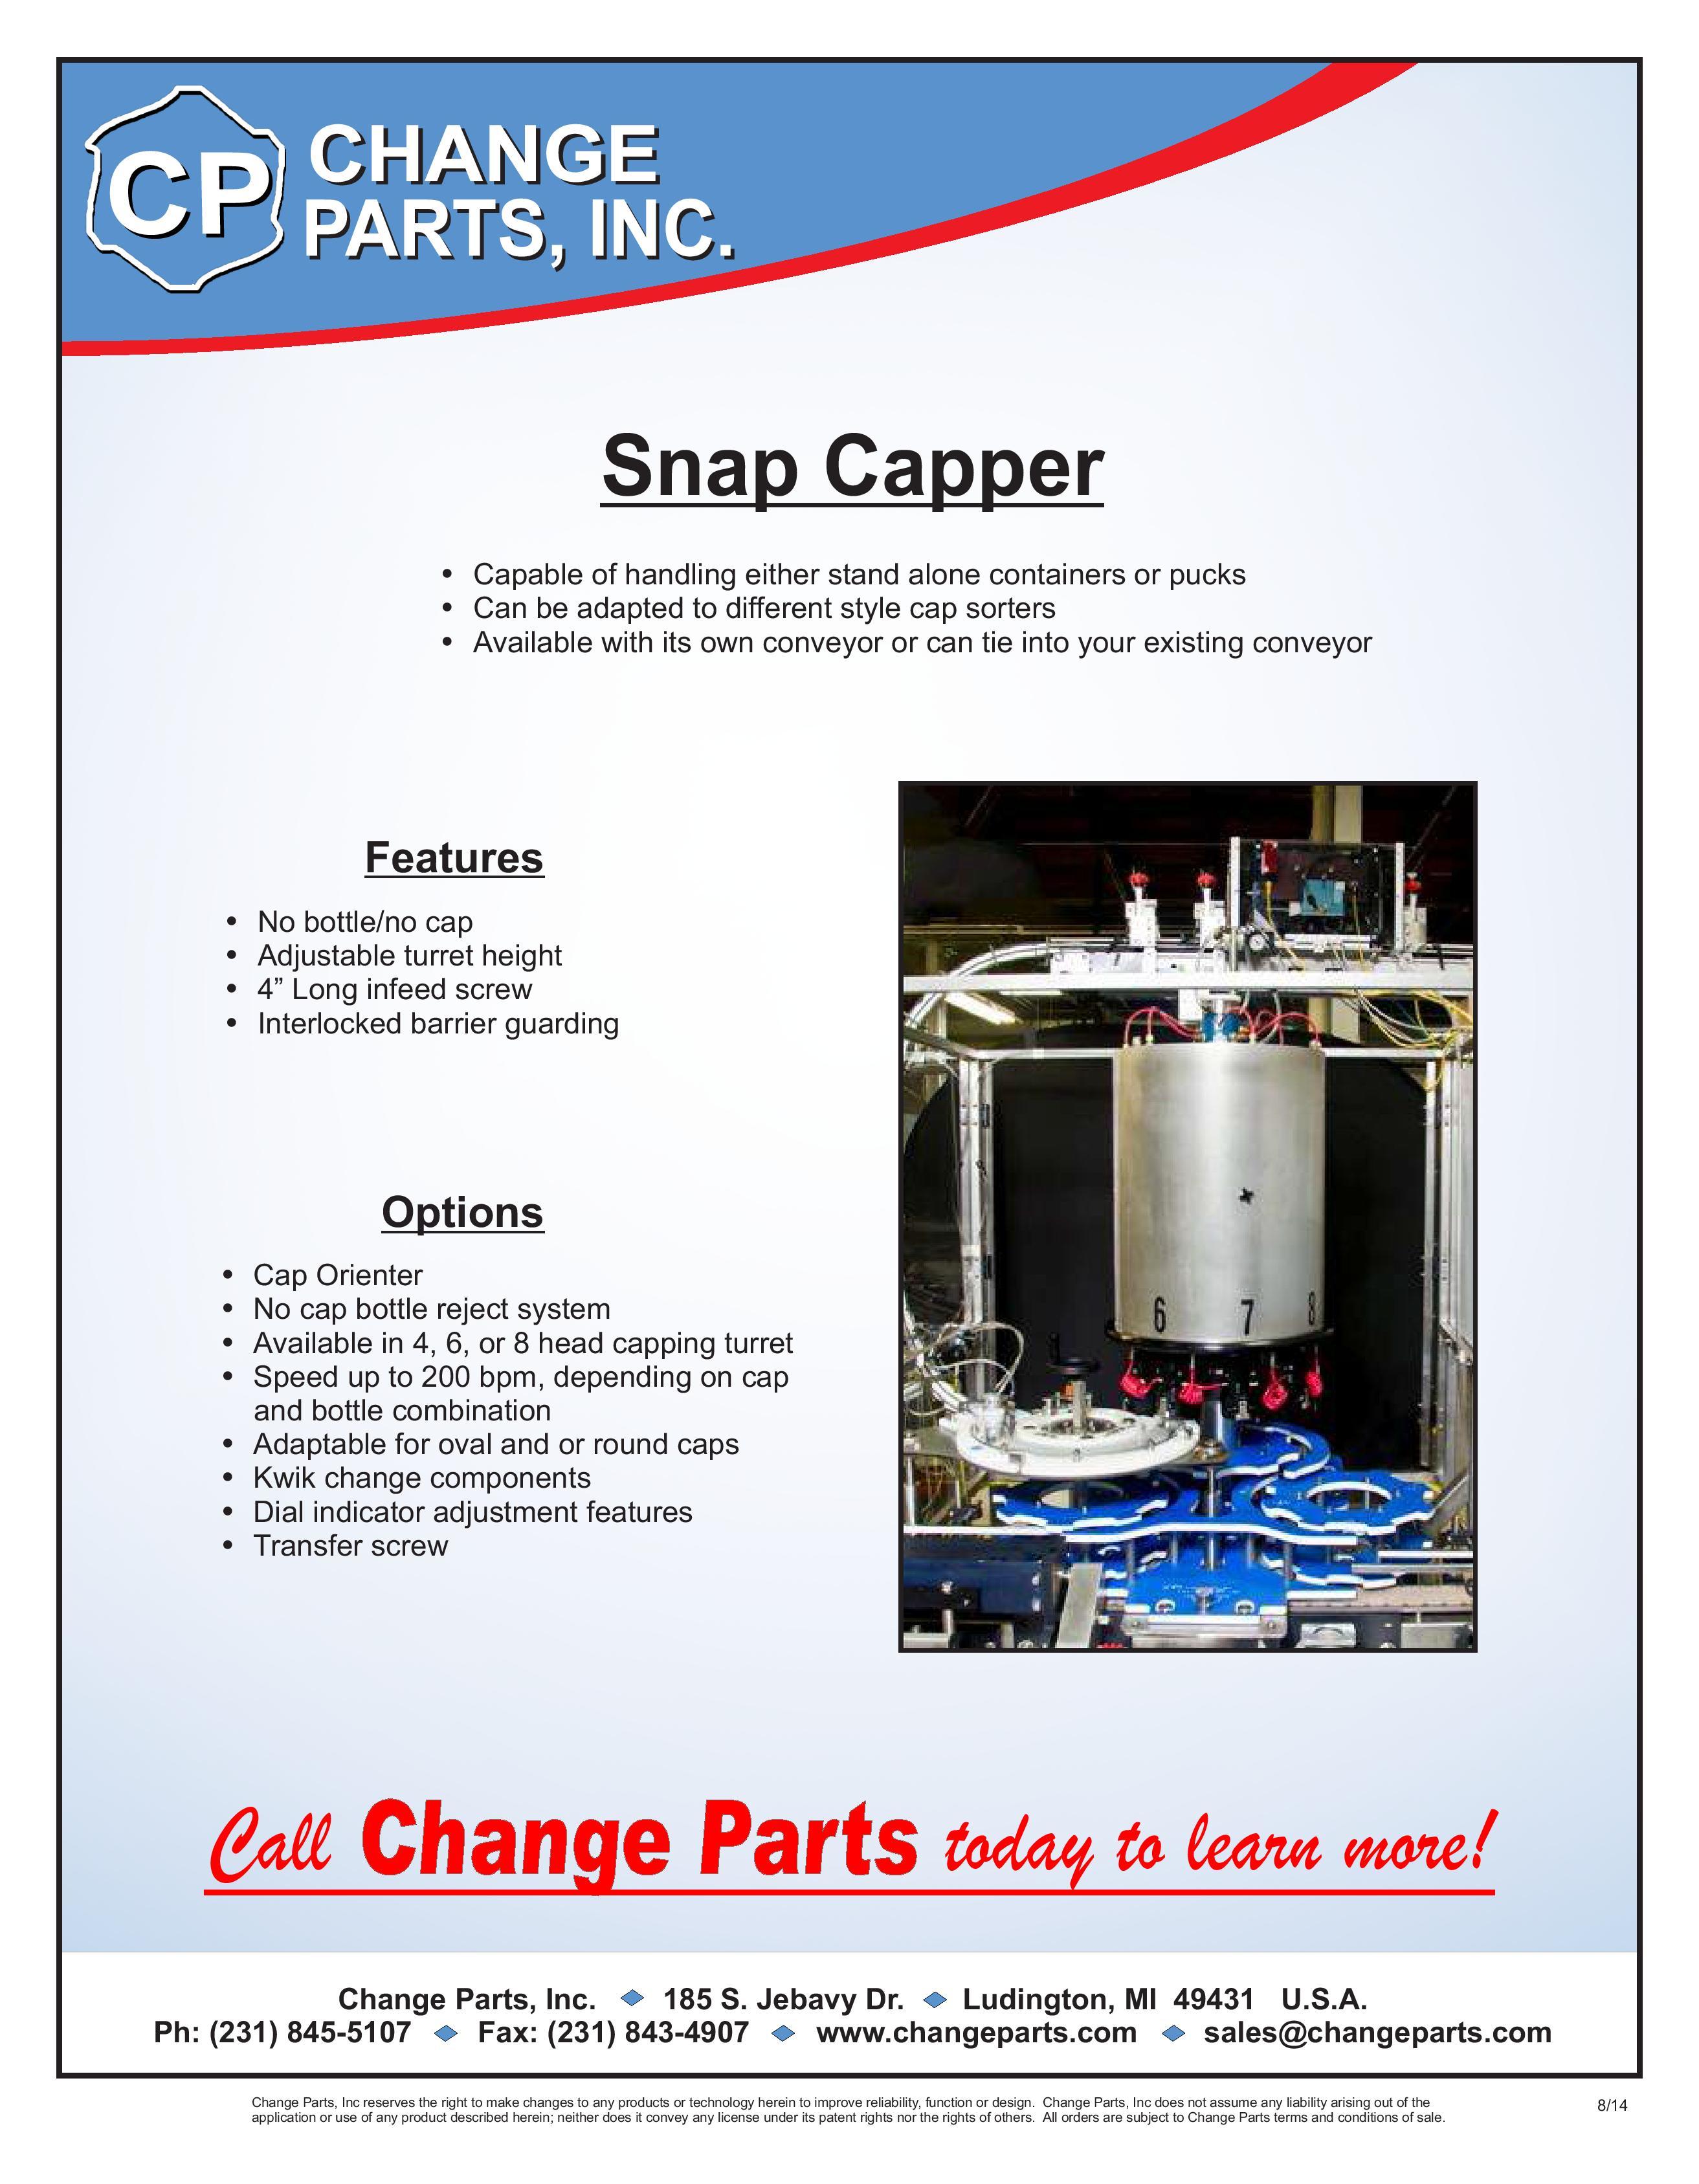 cpi-snap-capper-page-001.jpg